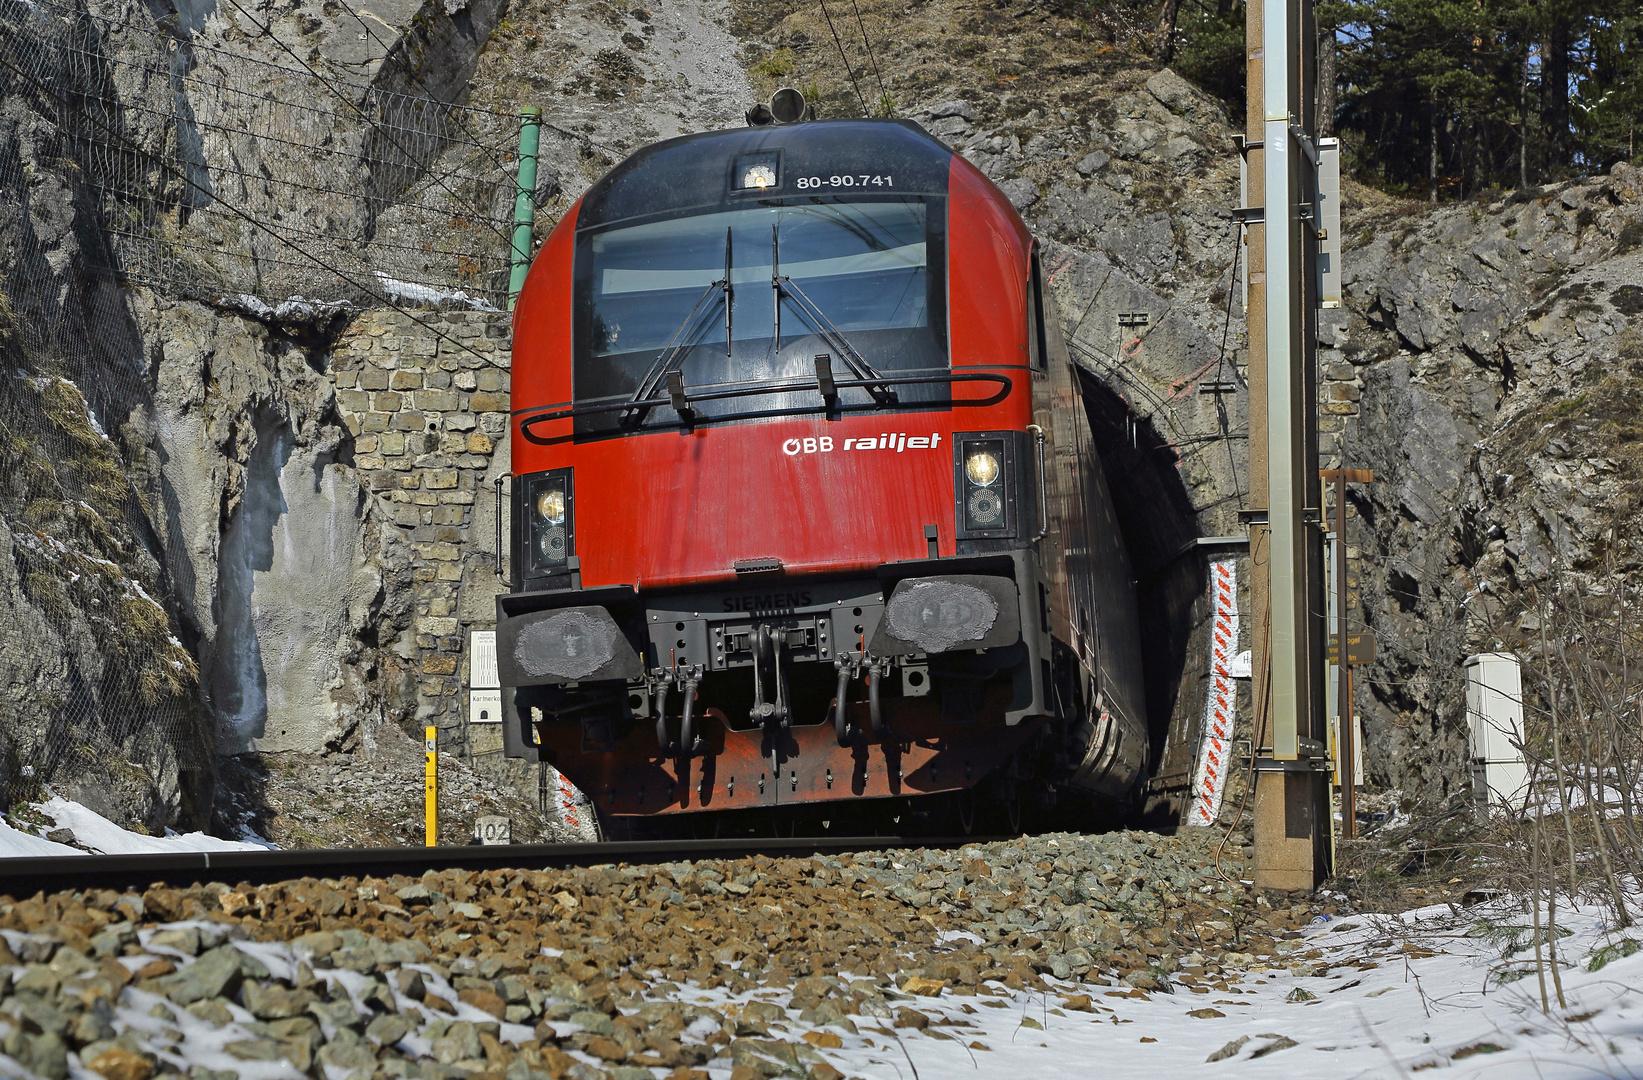 railjet 80-90.741